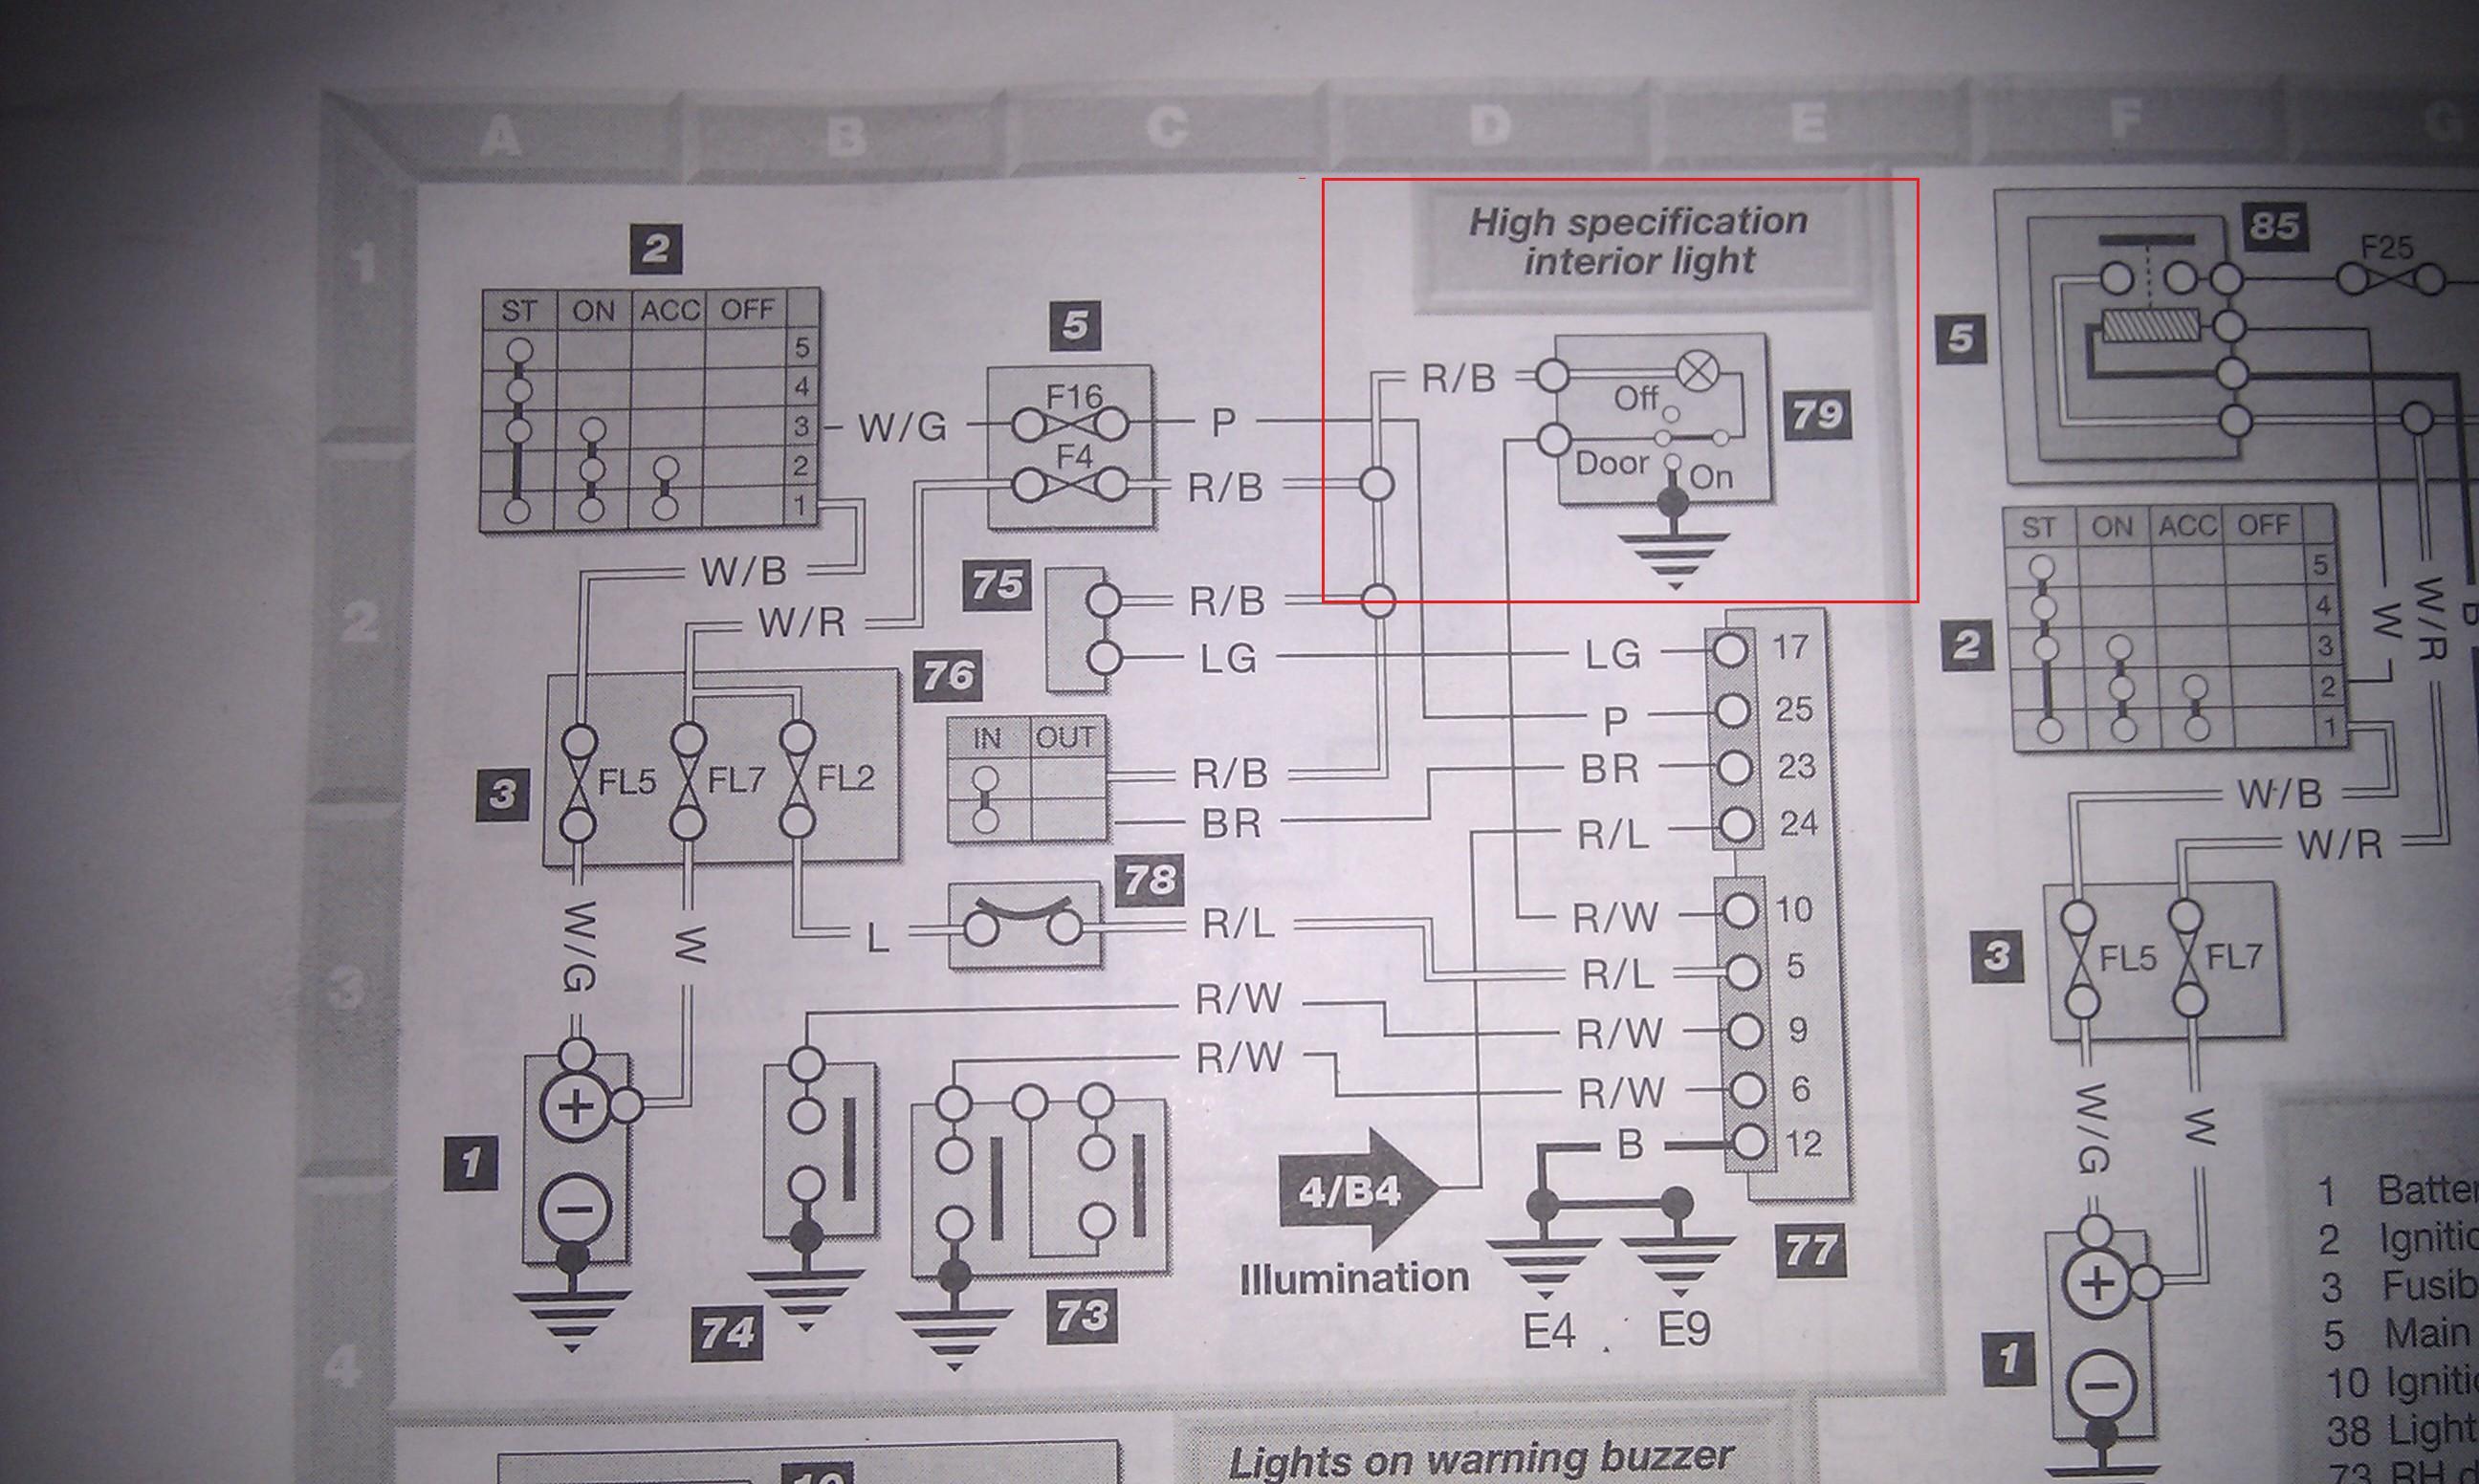 nissan march k11 wiring diagram wiring diagram nissan fuse diagram nissan micra headlight wiring diagram #12